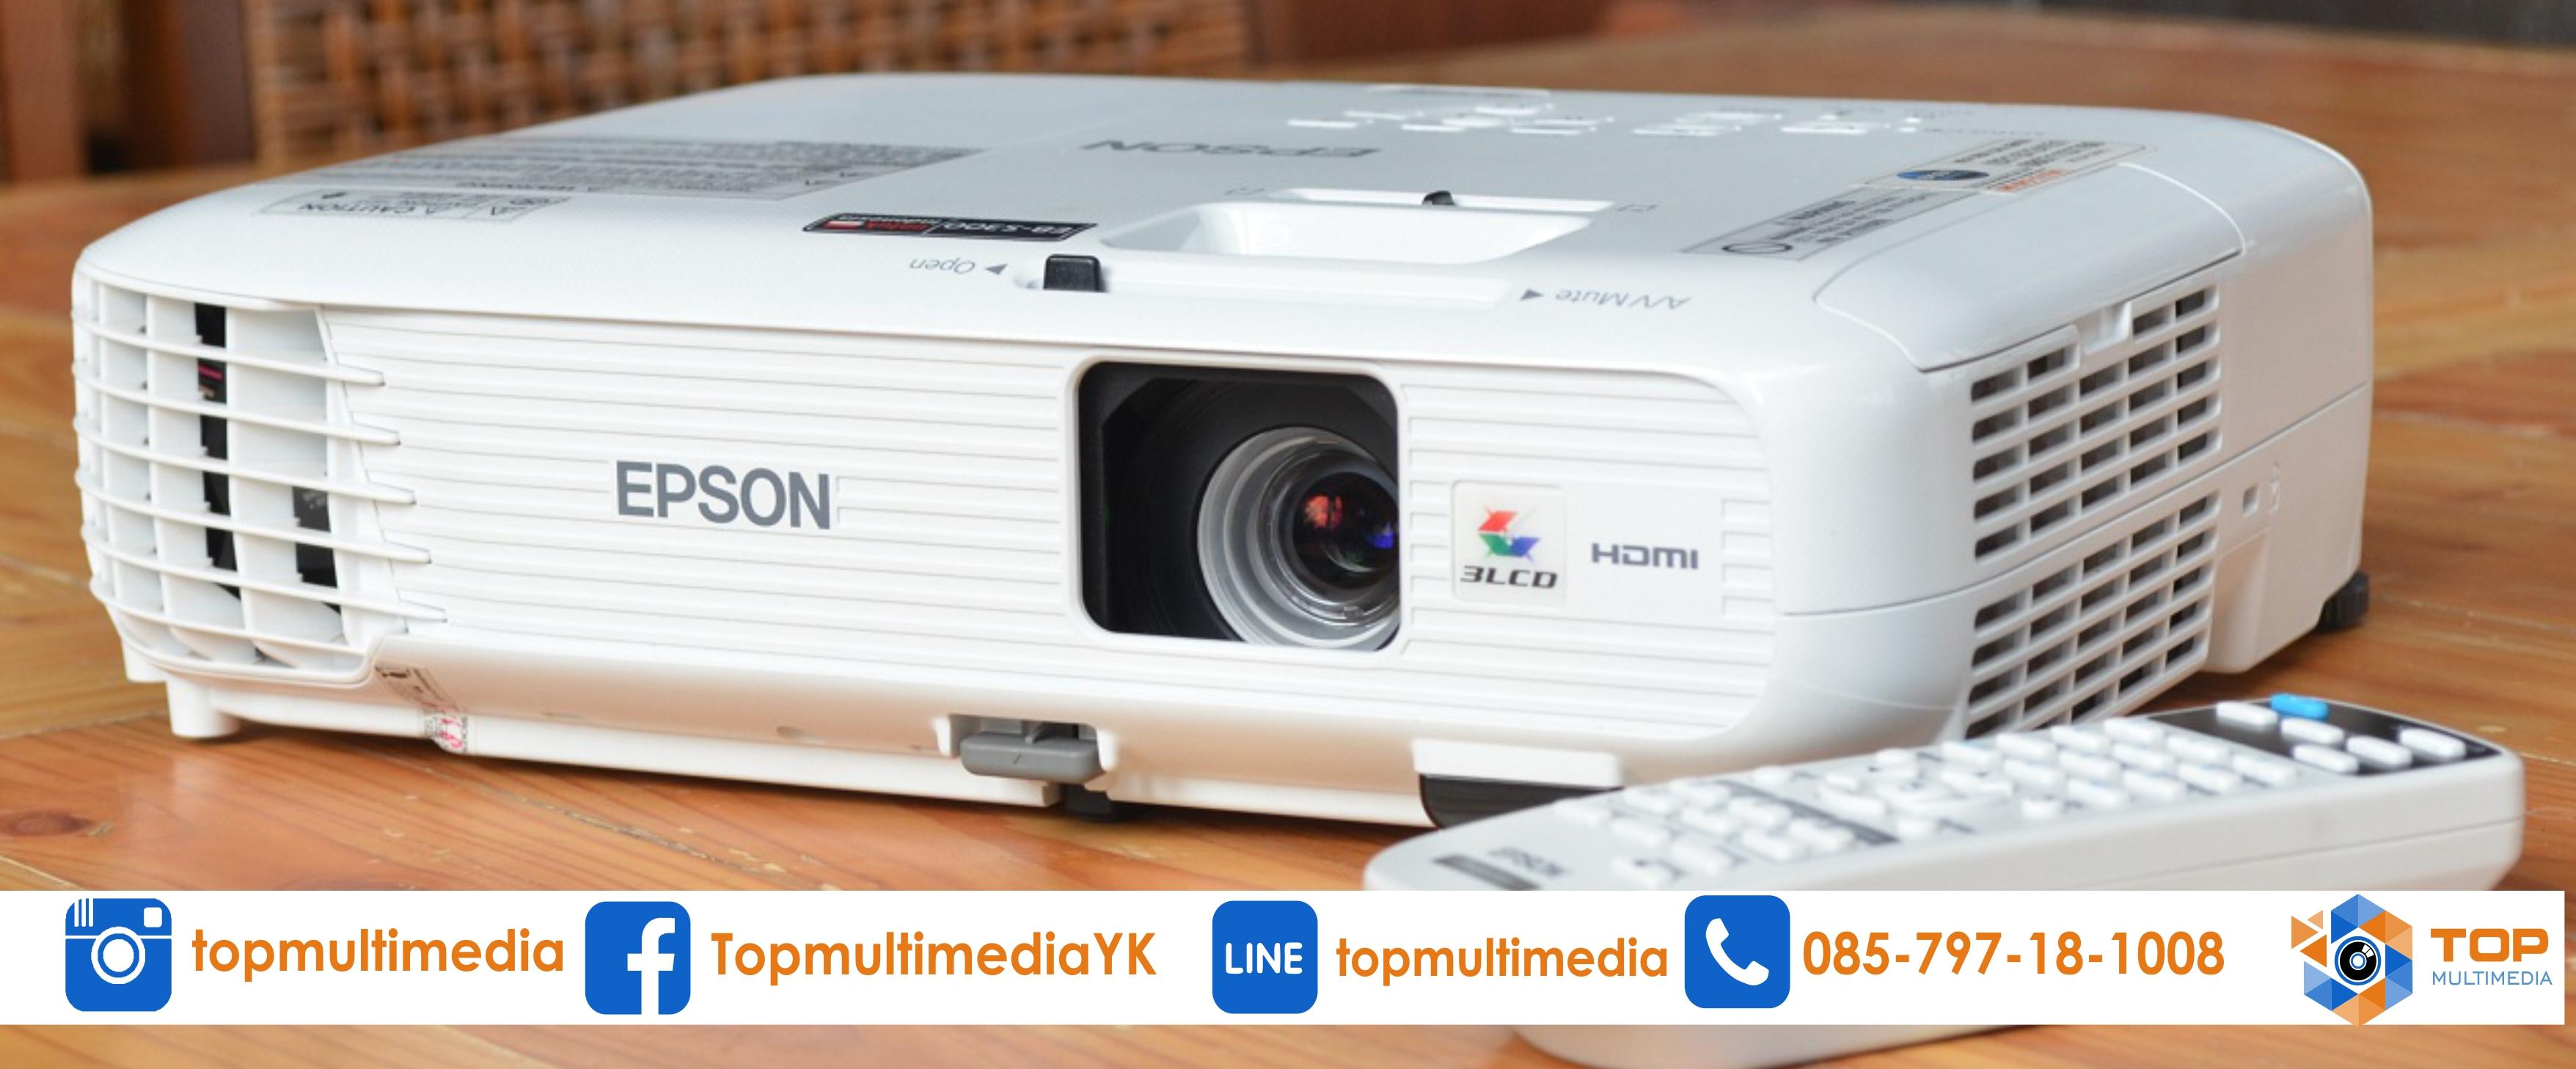 top multimedia | spesialis sewa lcd proyektor